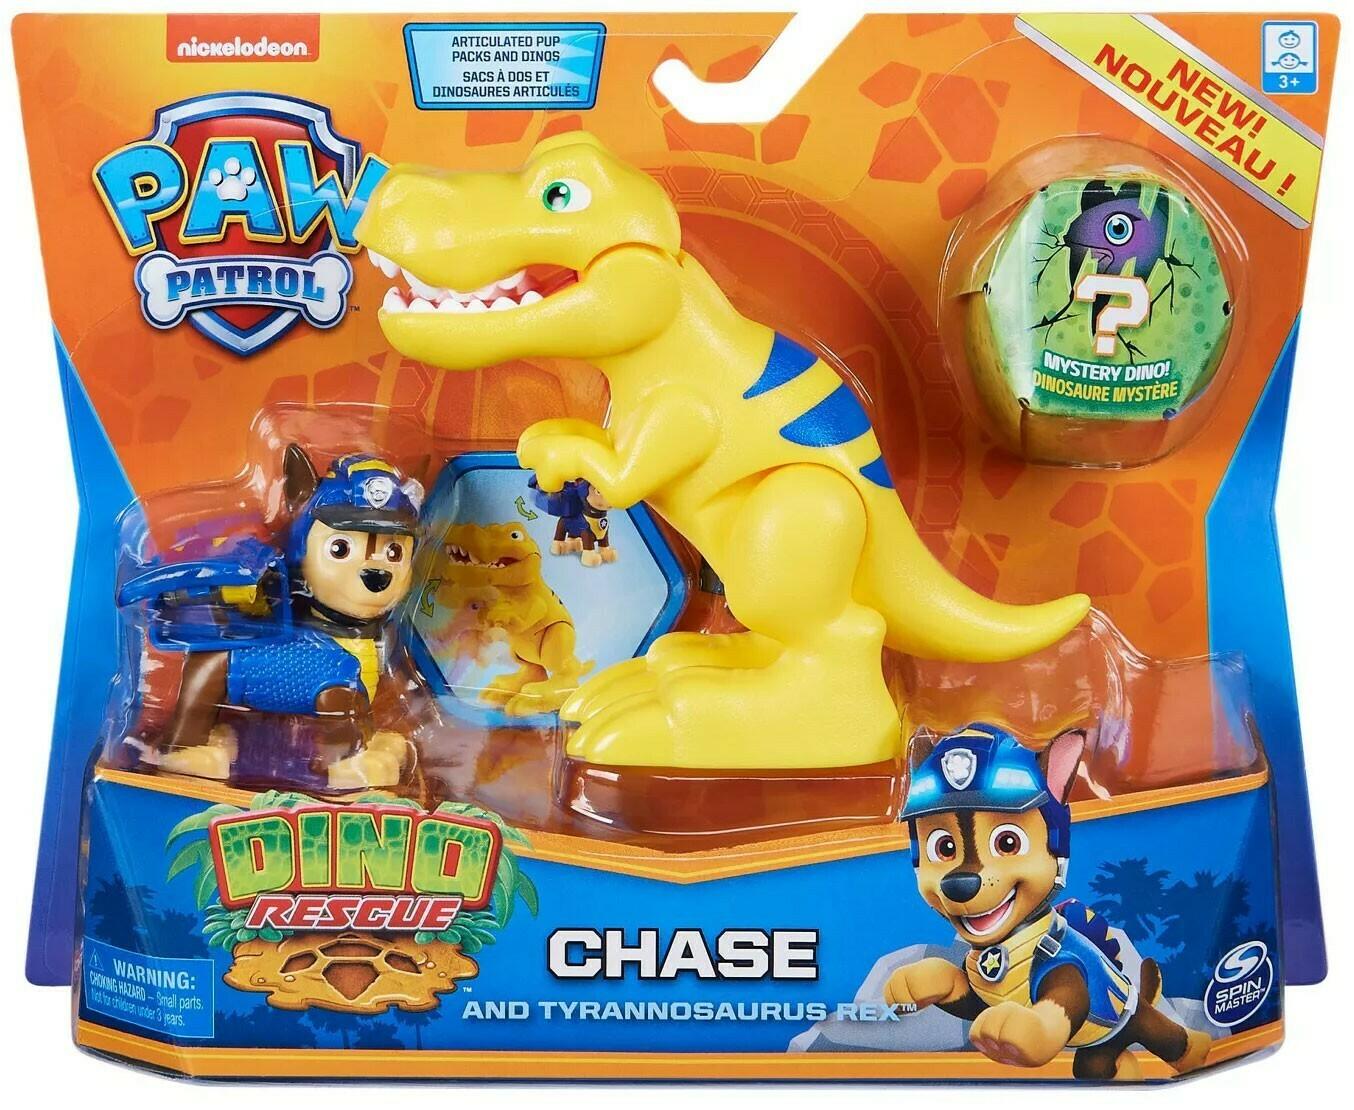 Paw Patrol Dino Rescue Chase and Tyrannosaurus Rex